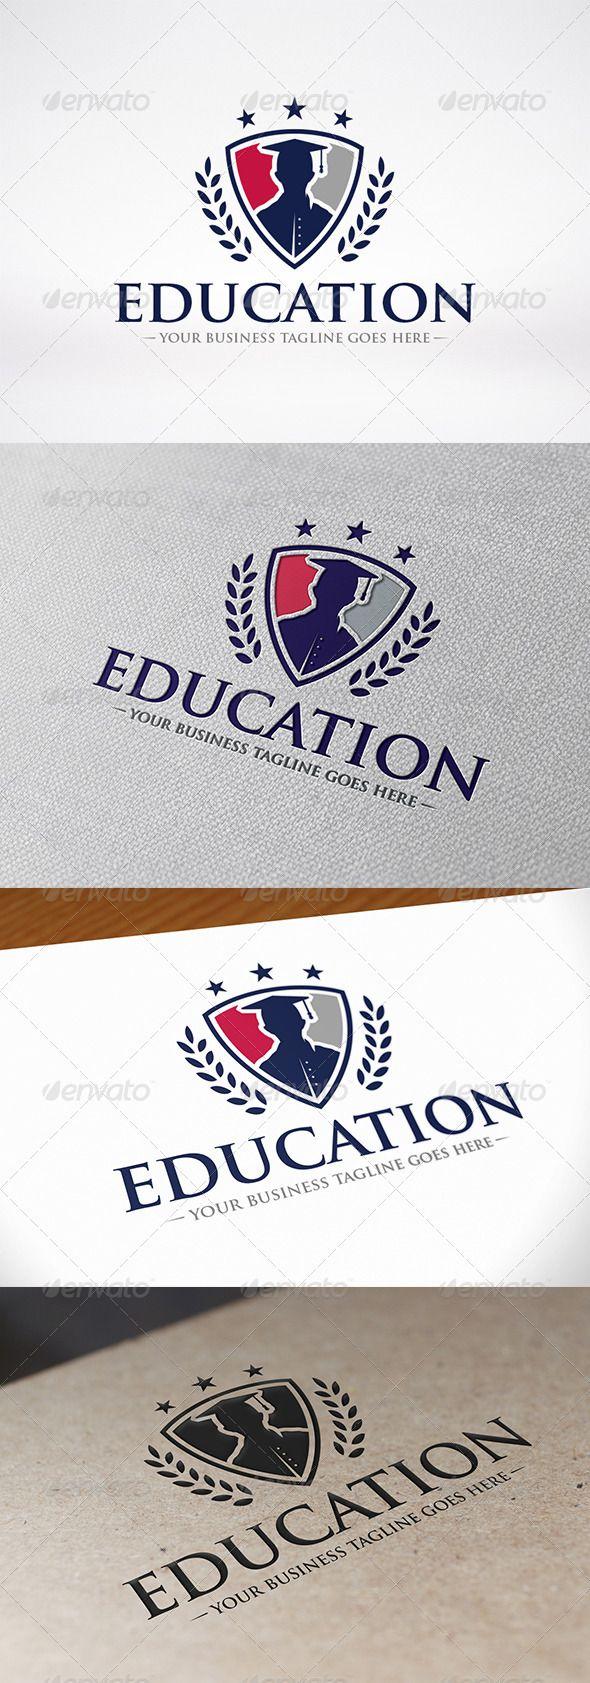 Education Logo Template #design #logotype Download: http://graphicriver.net/item/education-logo/8186979?ref=ksioks